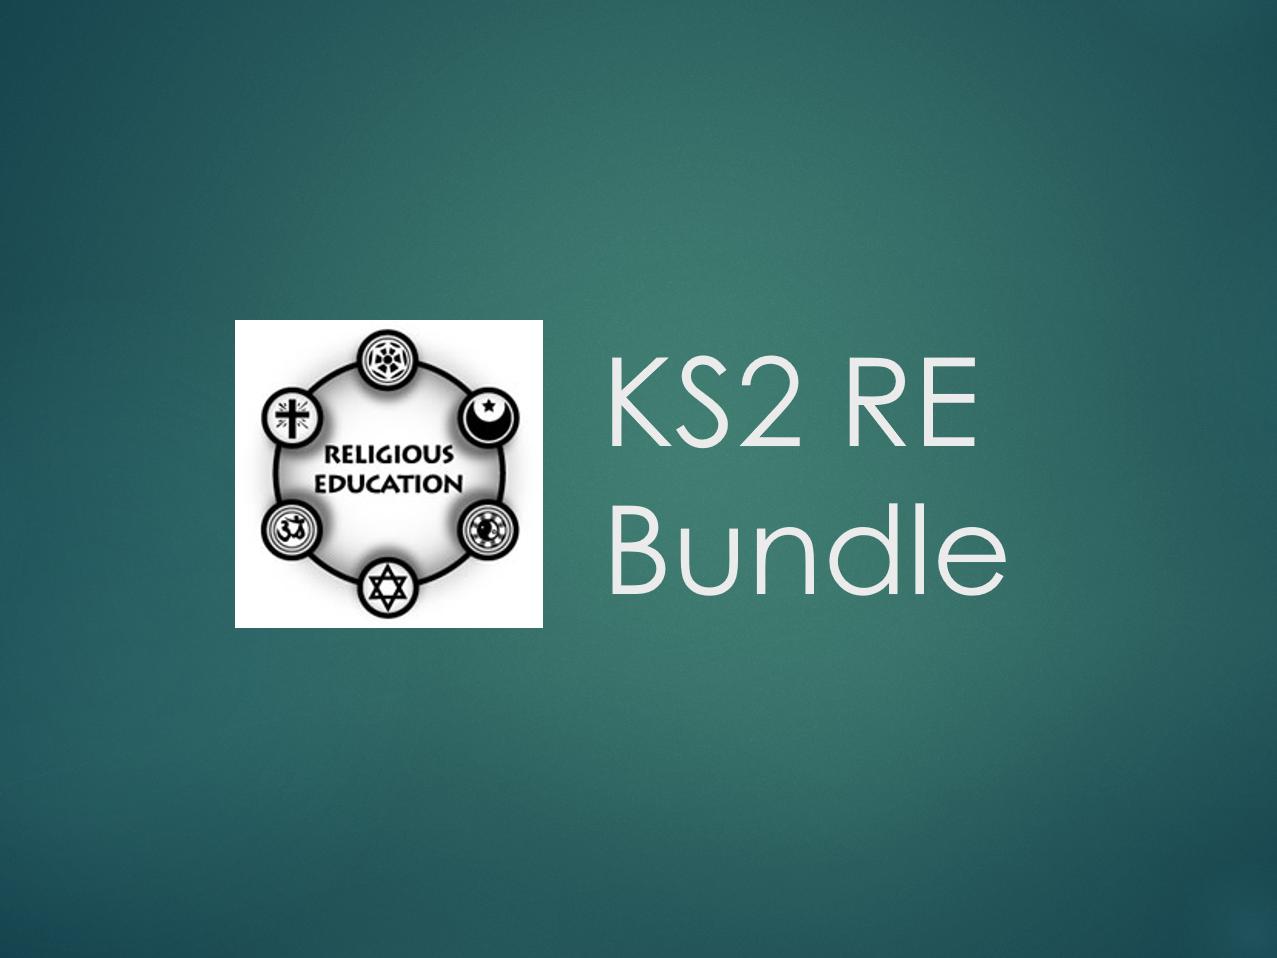 KS2 RE